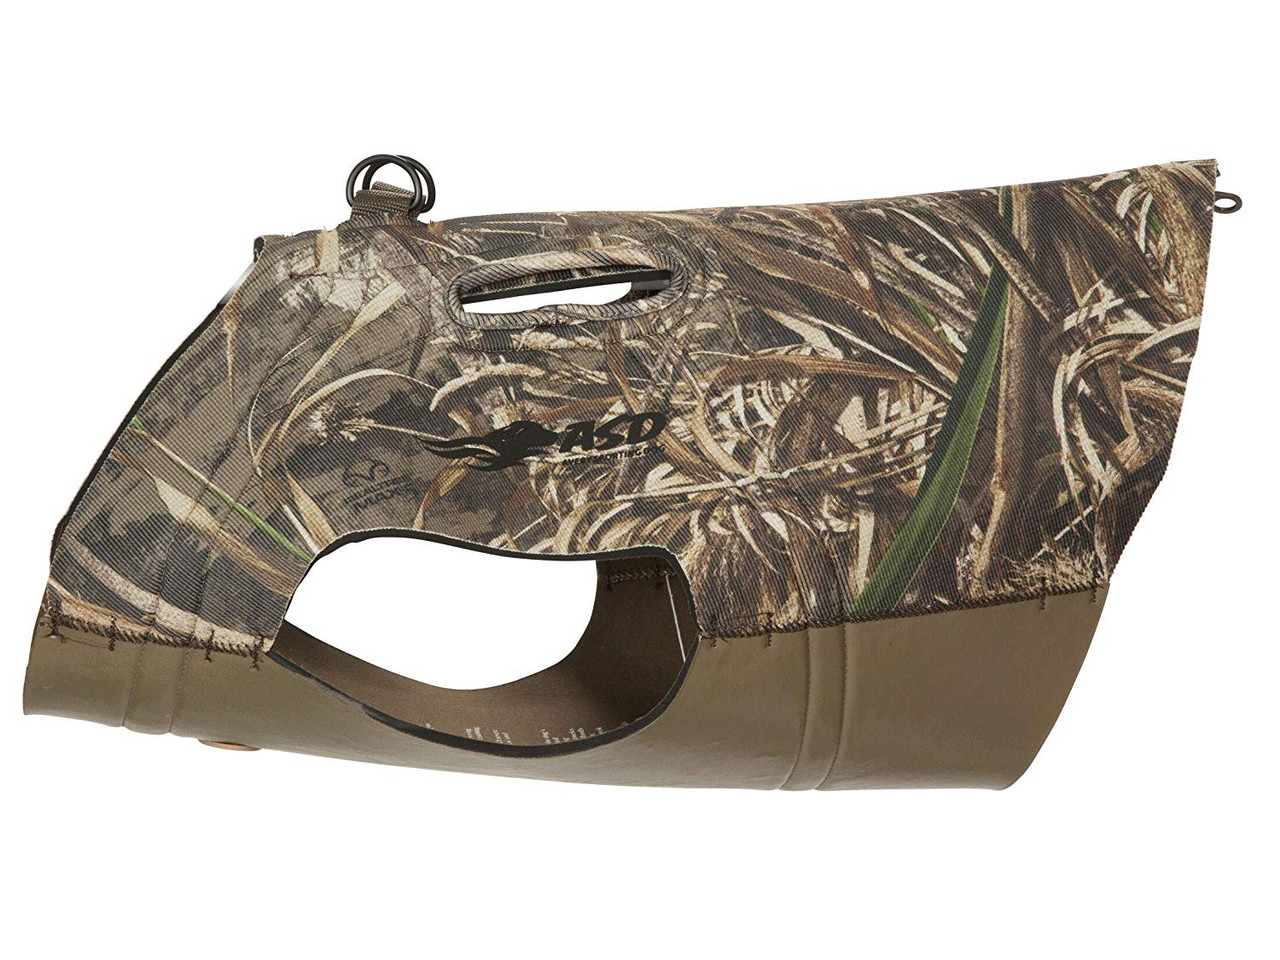 Avery Hunting Gear Full Zip Body Shield Pro Dog Parka, Max 5, 2x-Large